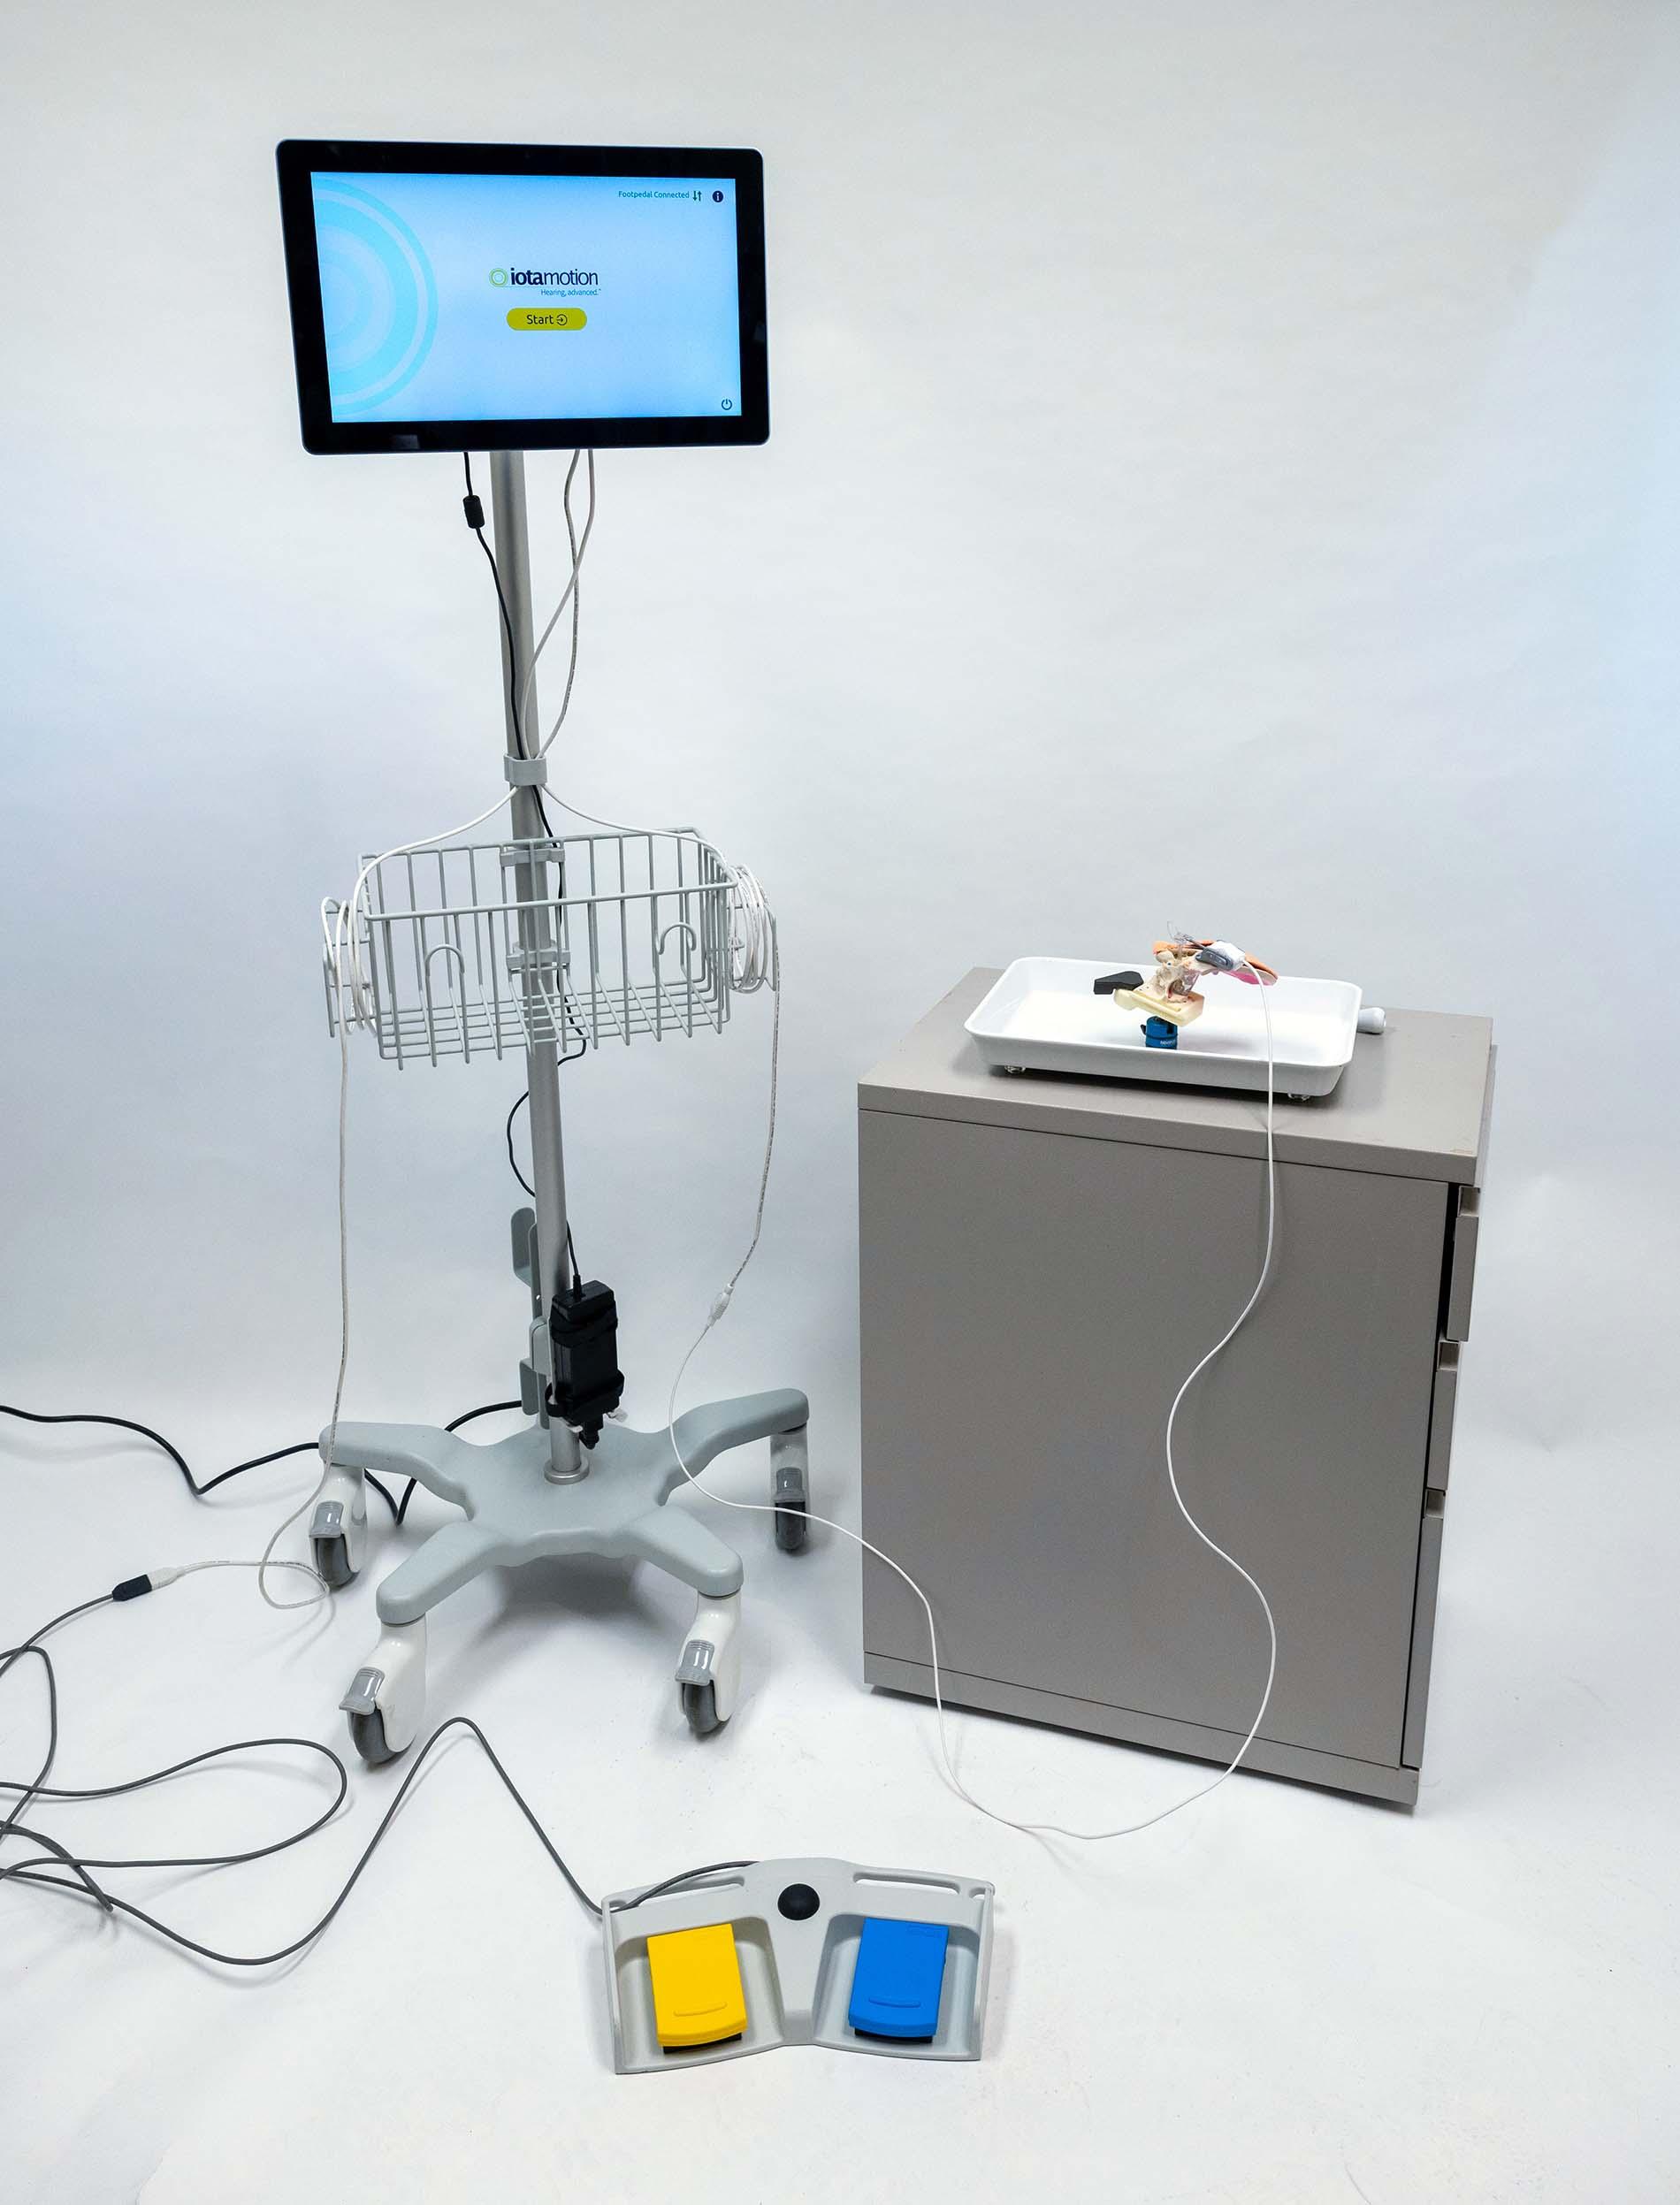 iotamotion-robotic-system